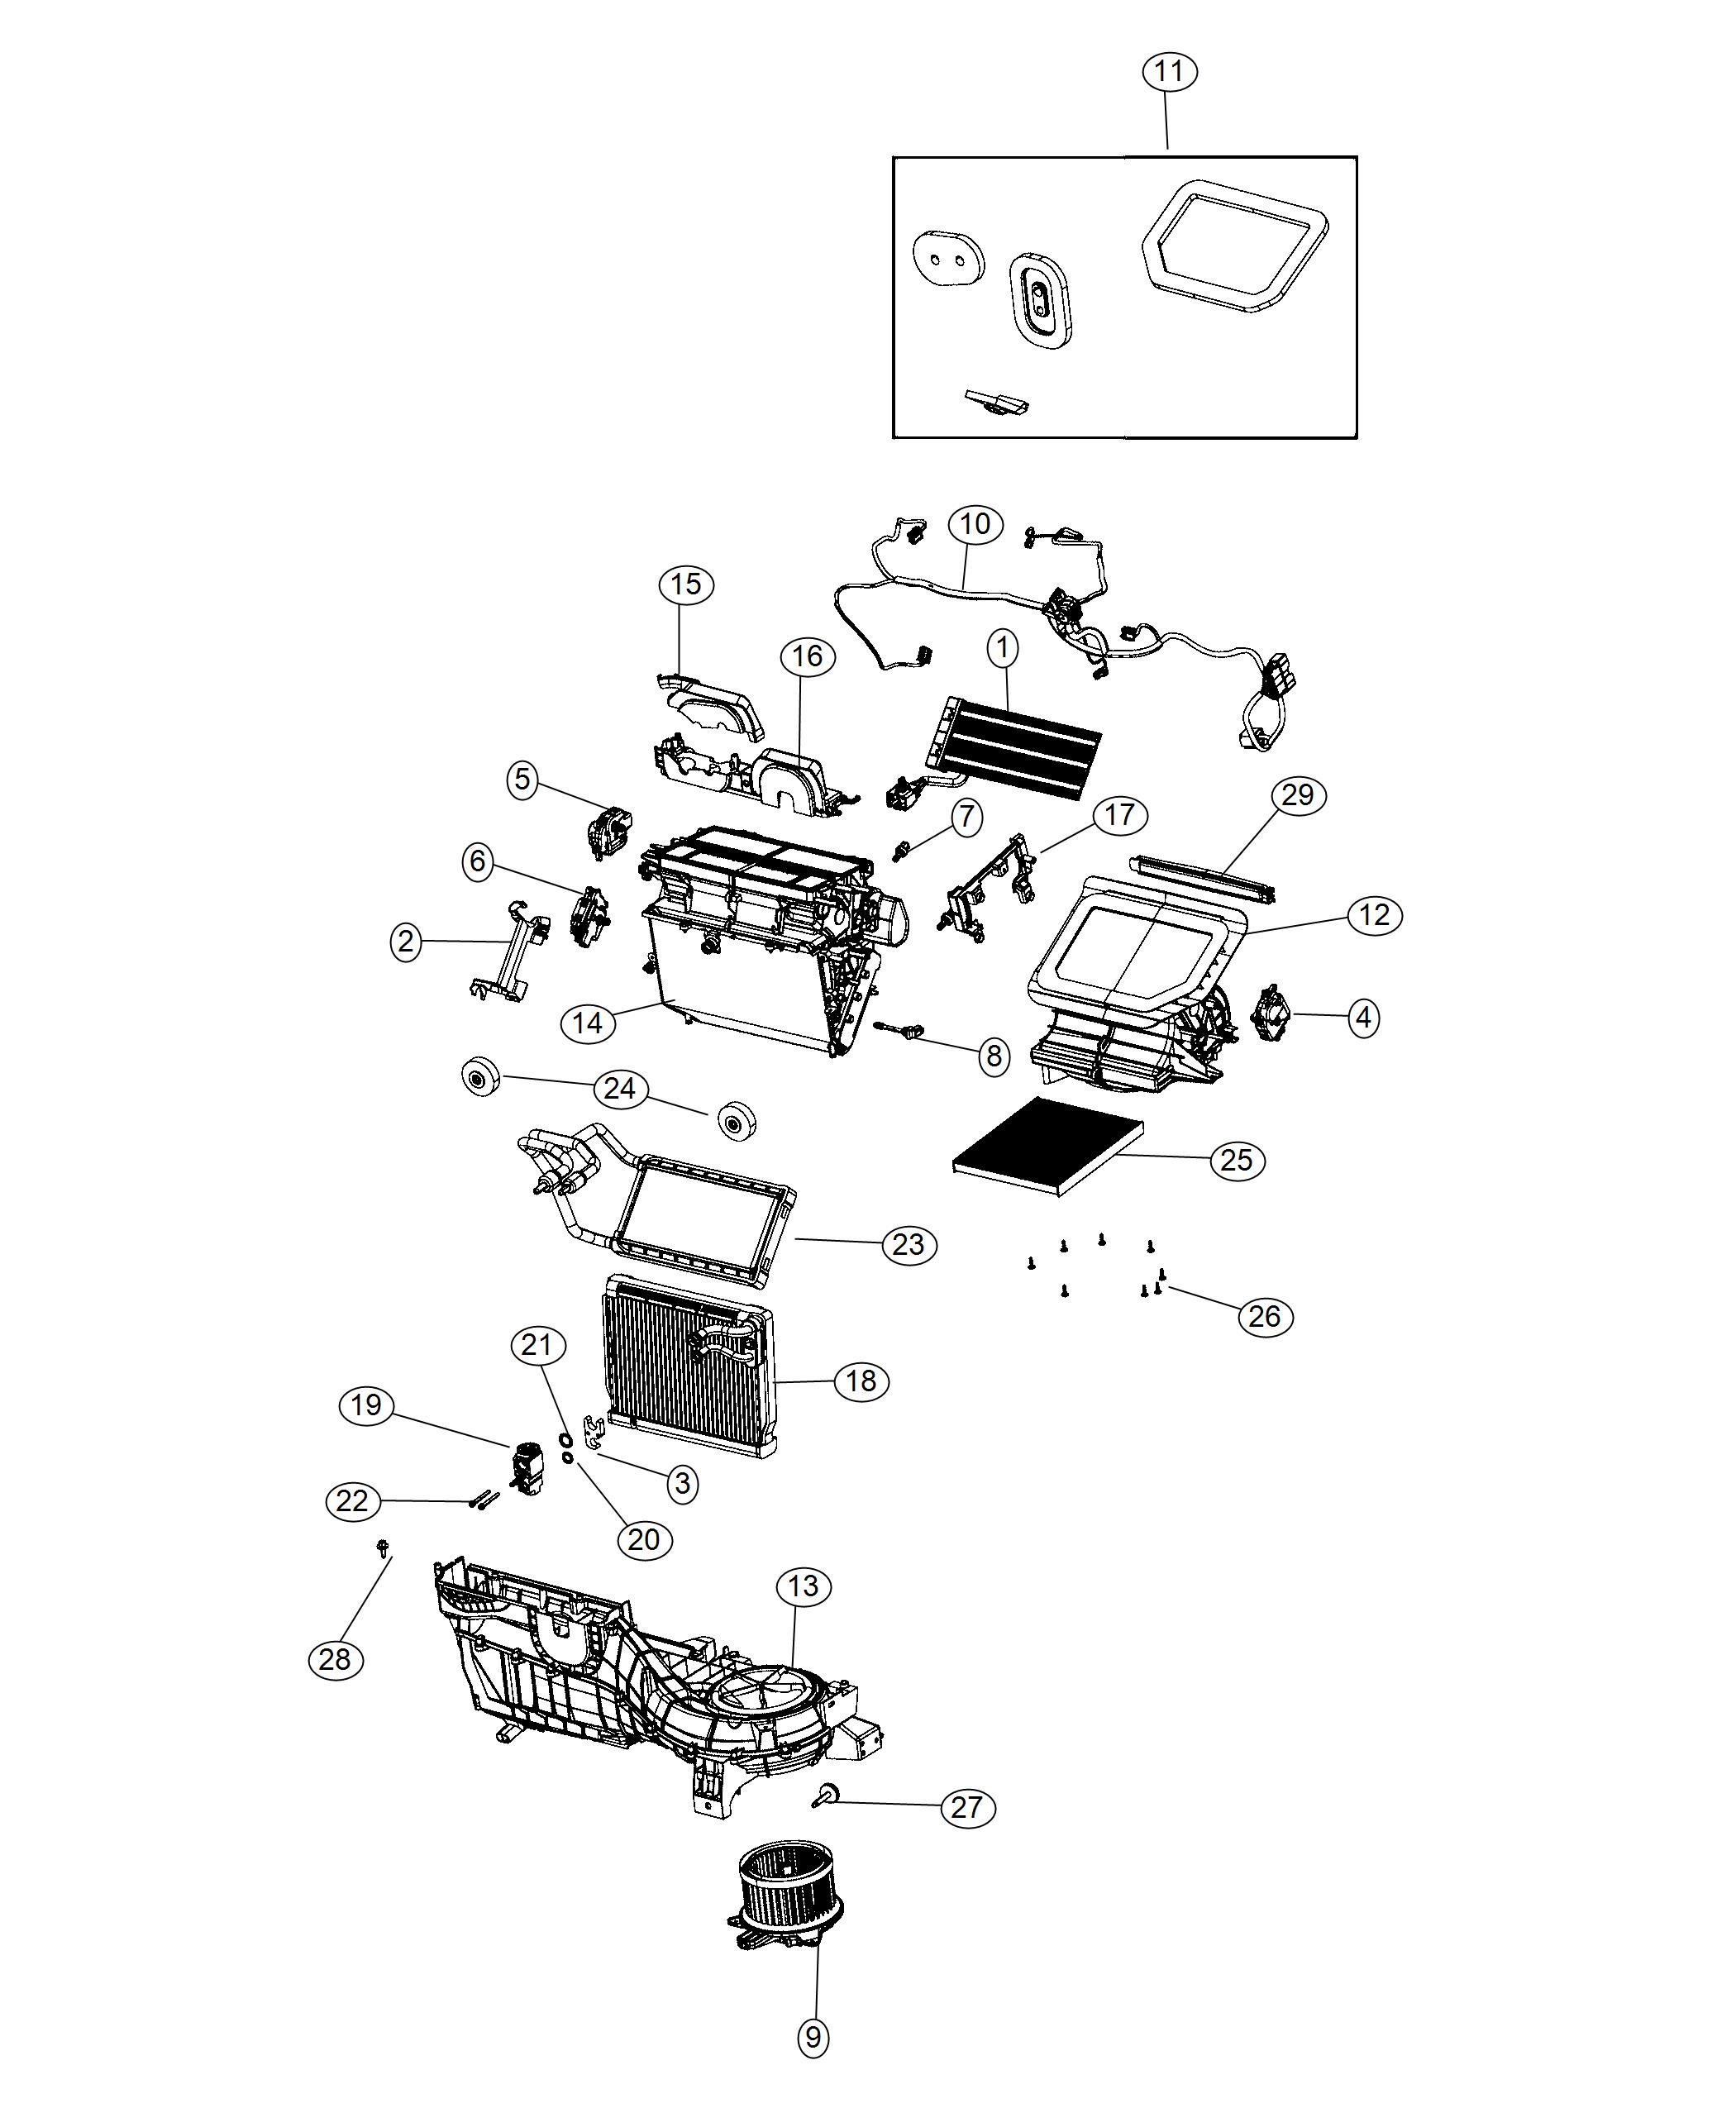 Jeep Wrangler Evaporator Air Conditioning